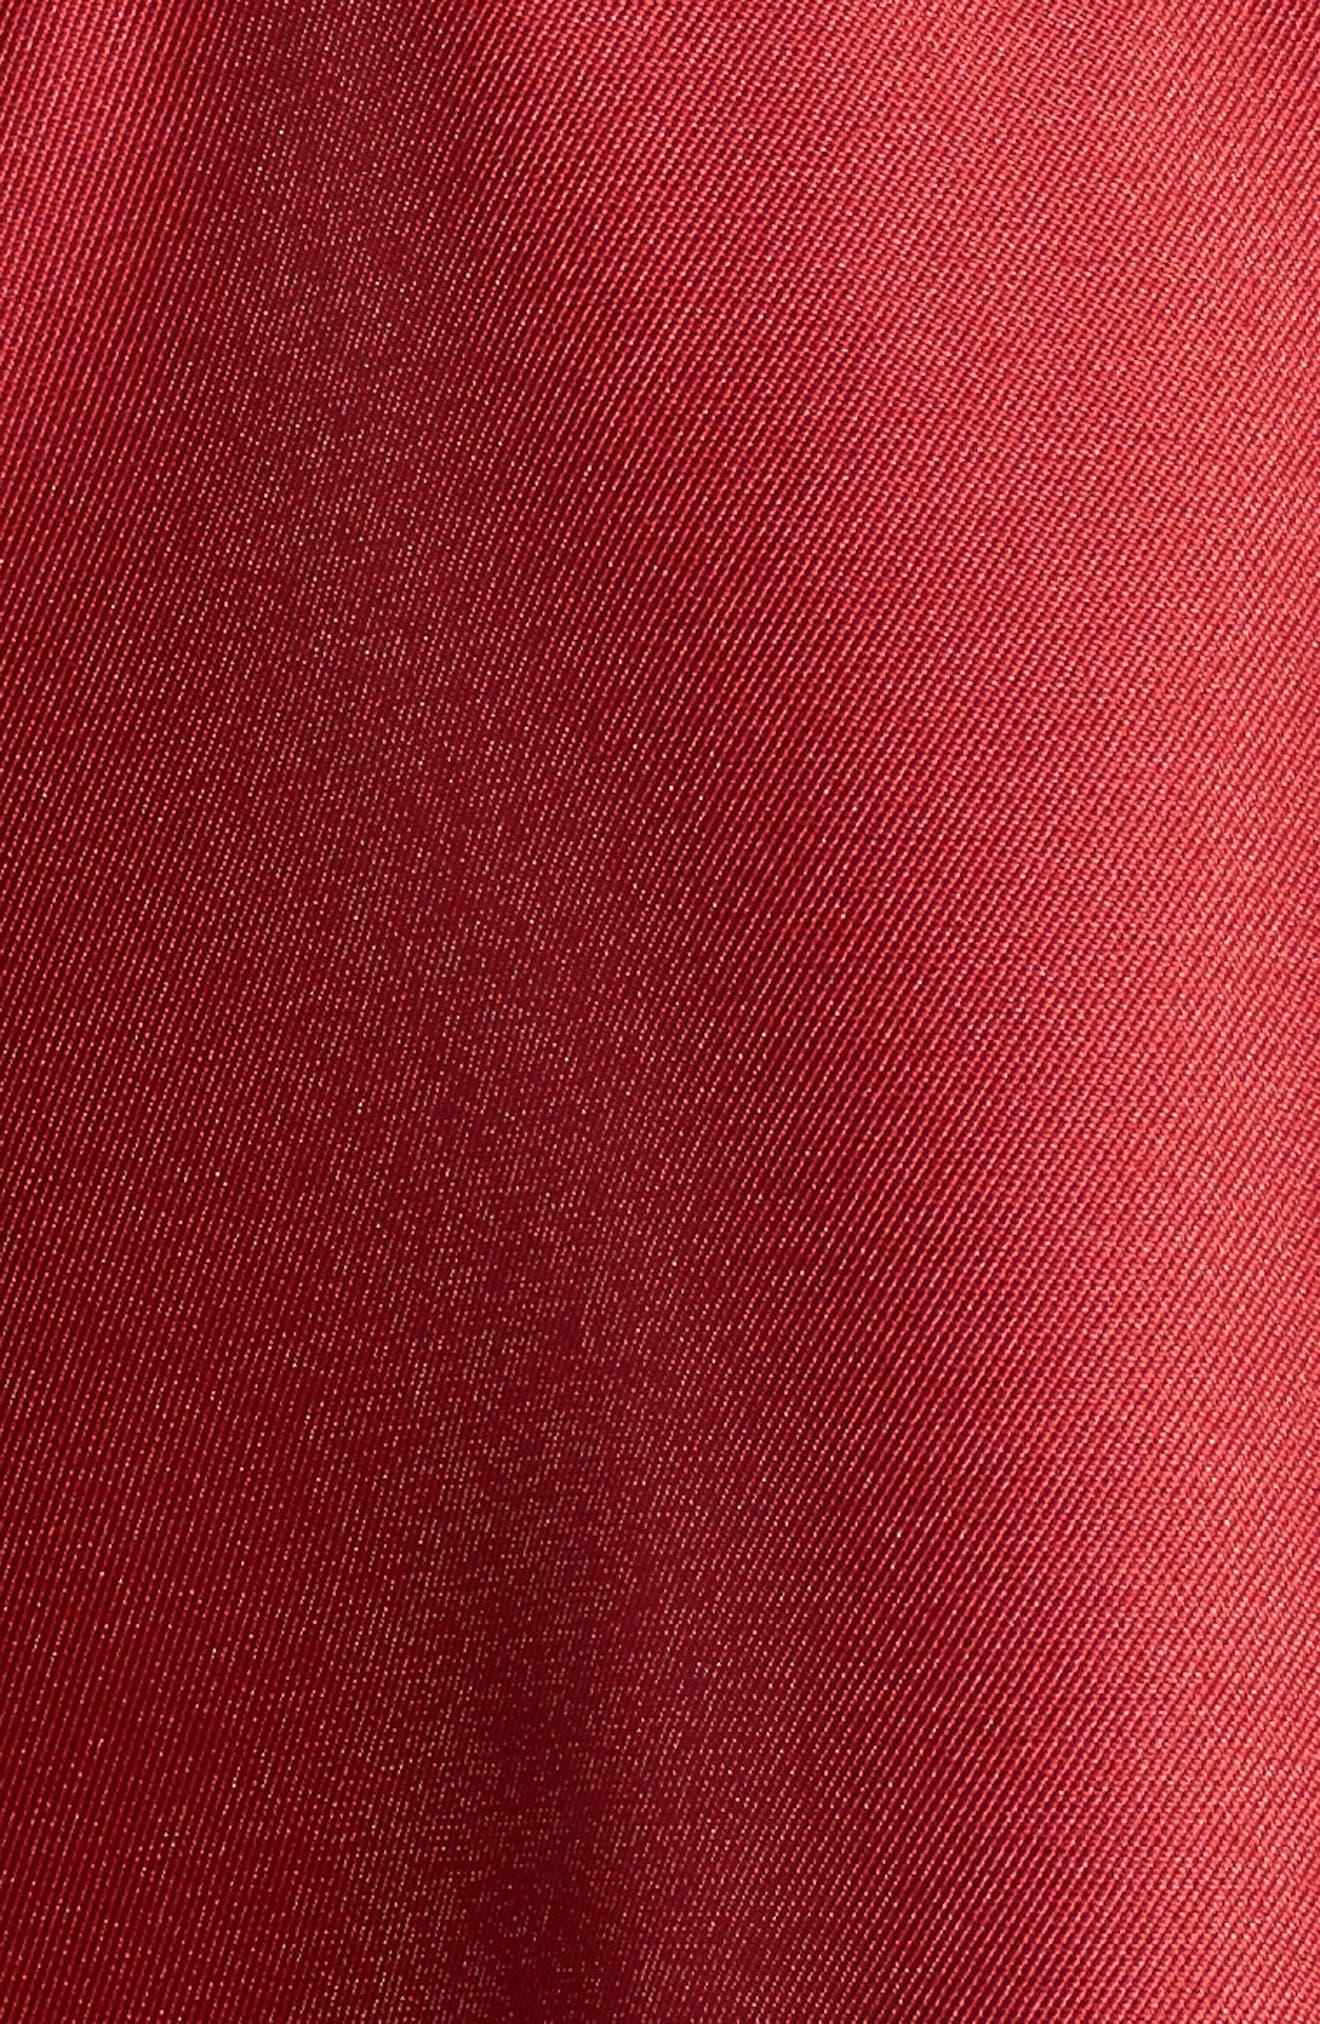 Mikado Ballgown,                             Alternate thumbnail 5, color,                             Cardinal